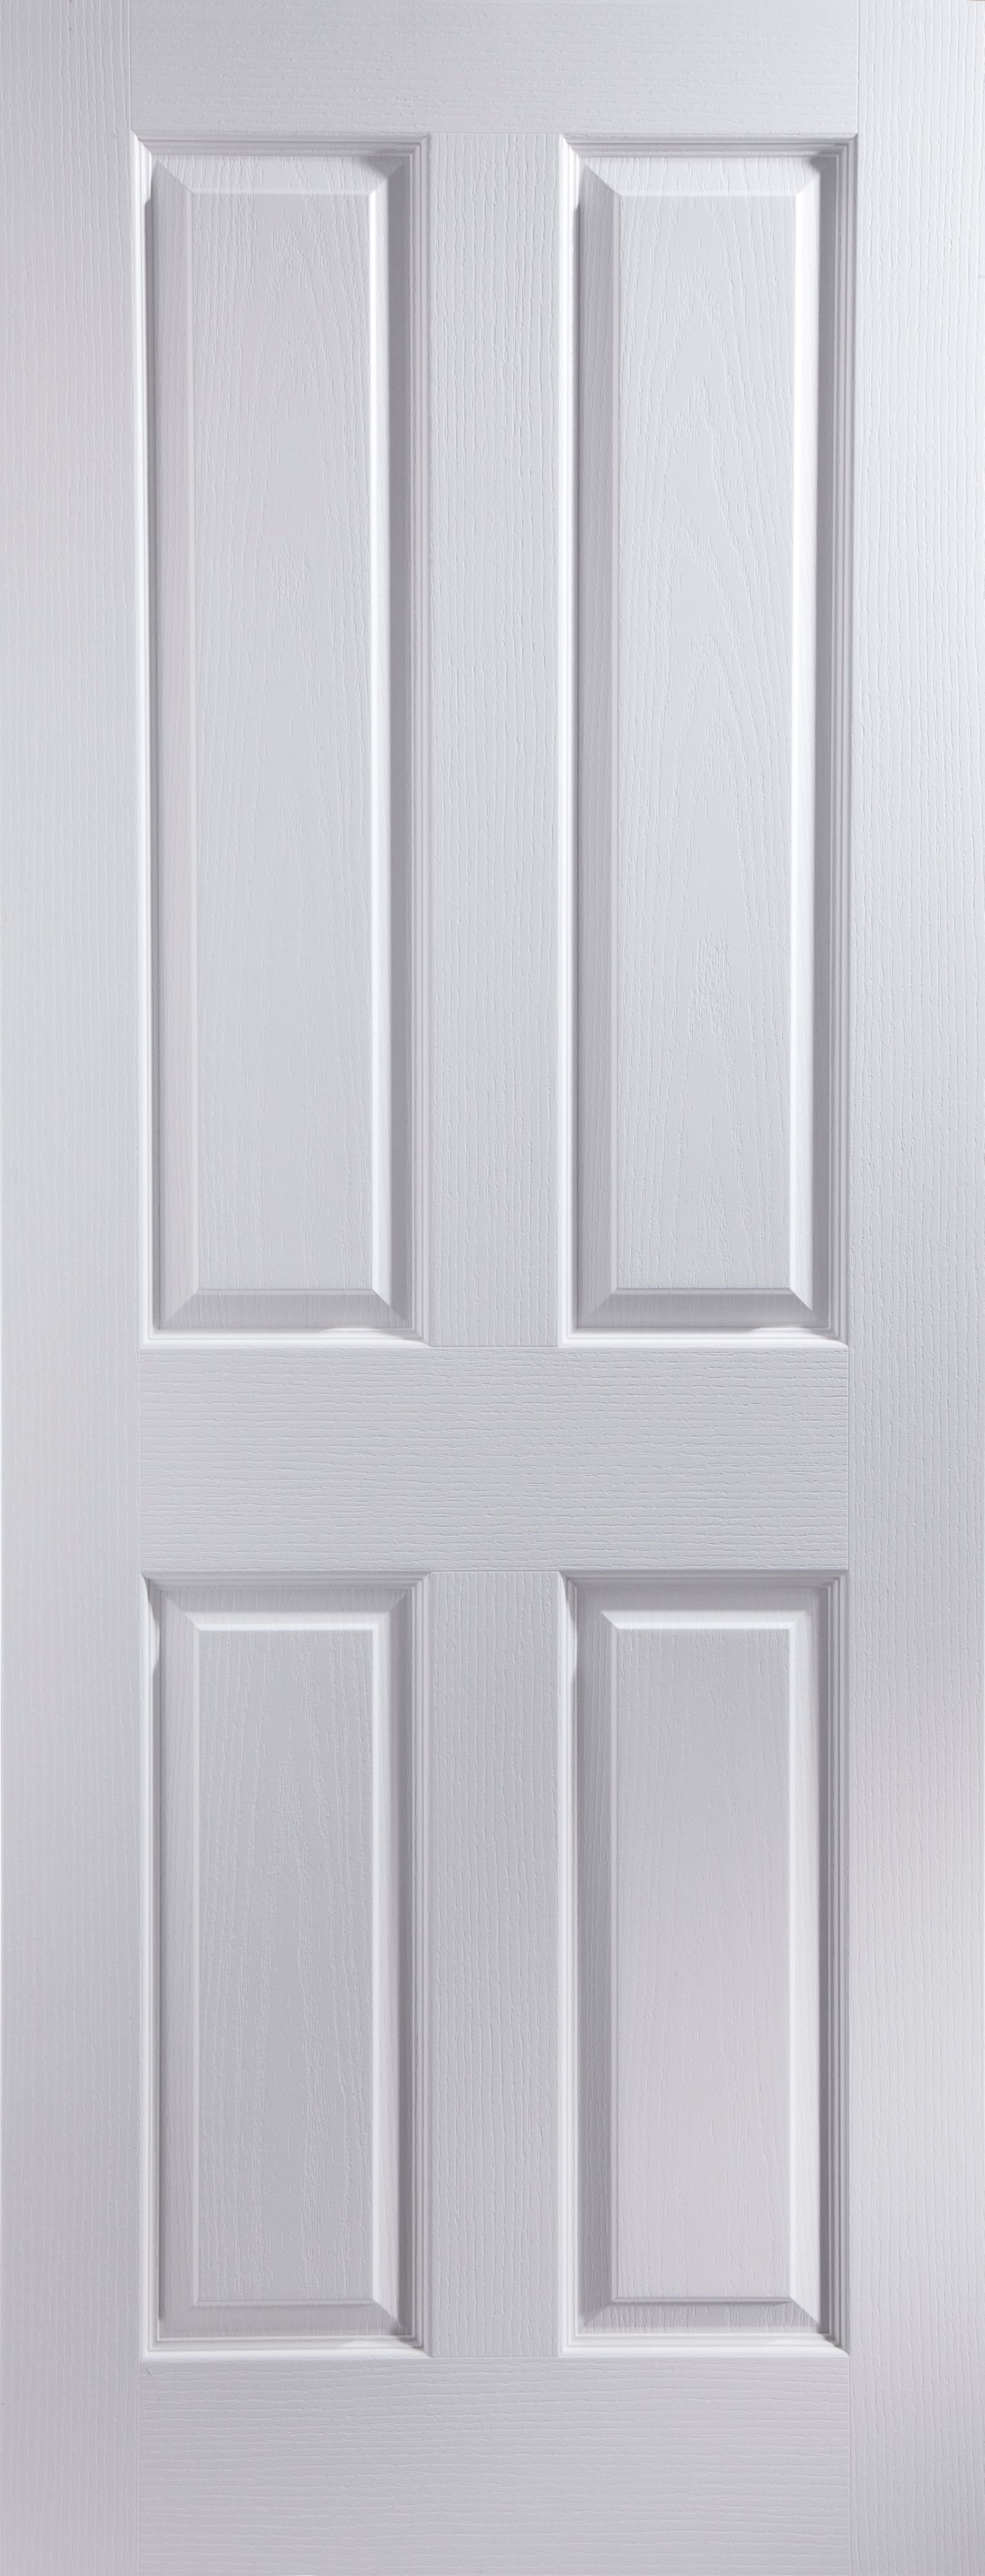 4 Panel Pre Painted White Woodgrain Unglazed Internal